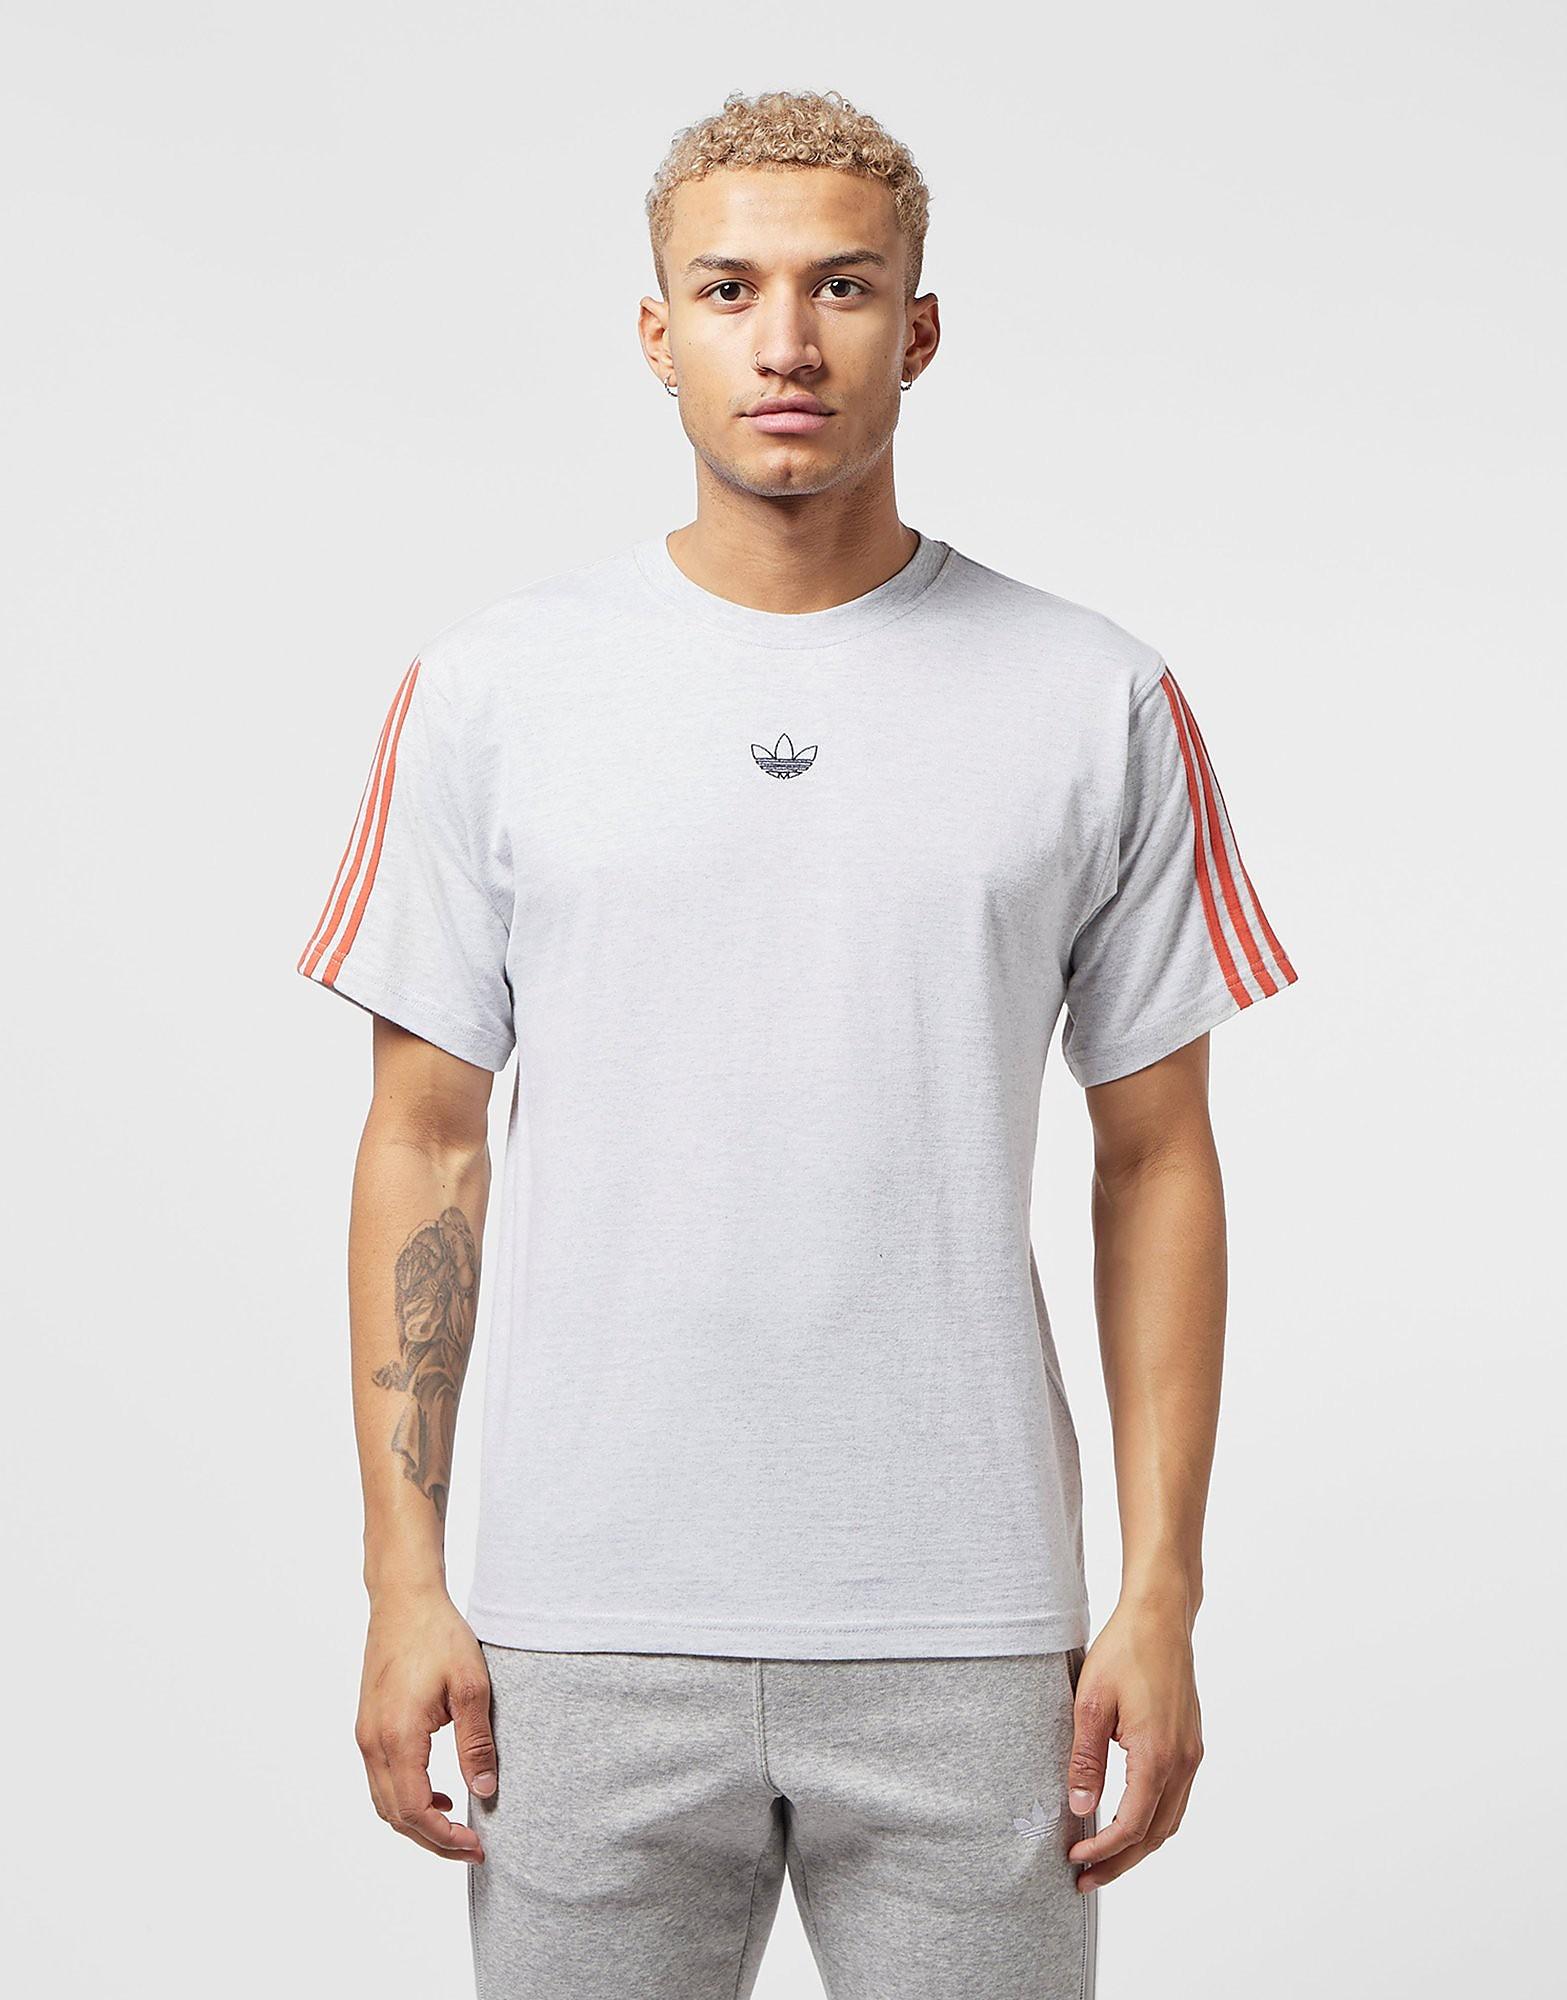 adidas Originals Floating Short Sleeve T-Shirt